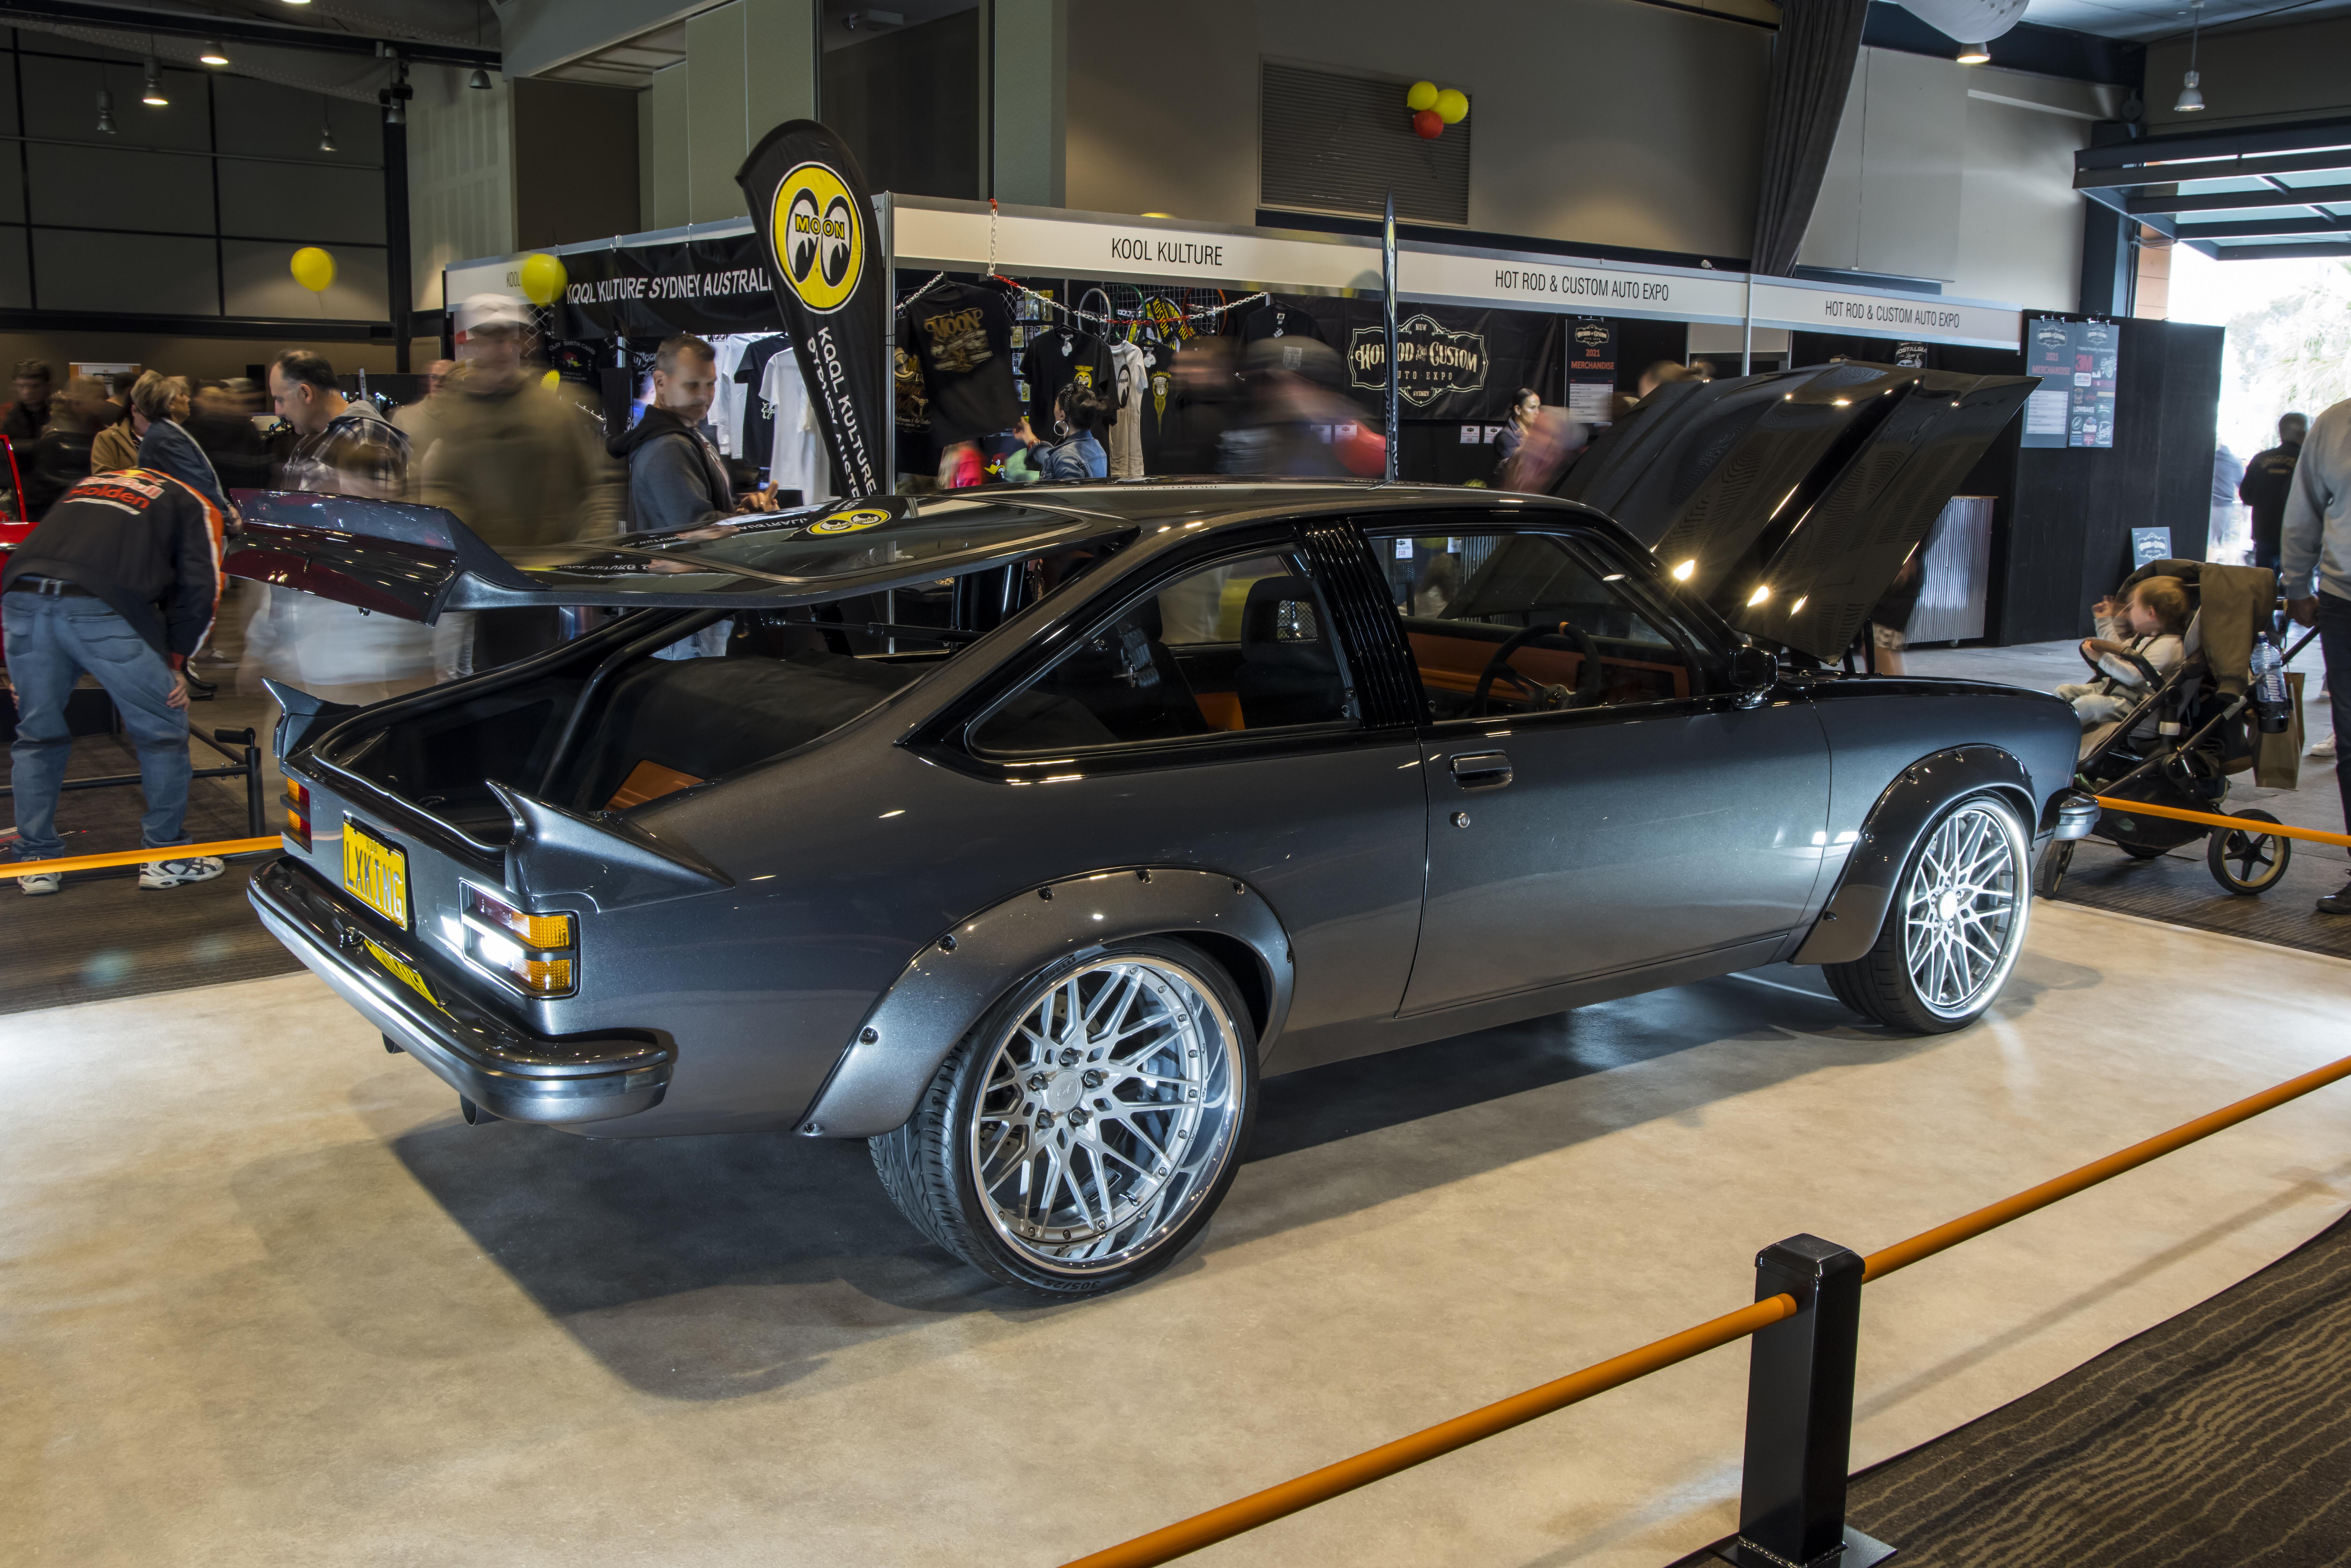 Street Machine Events Hotrod Custom Auto Expo 006